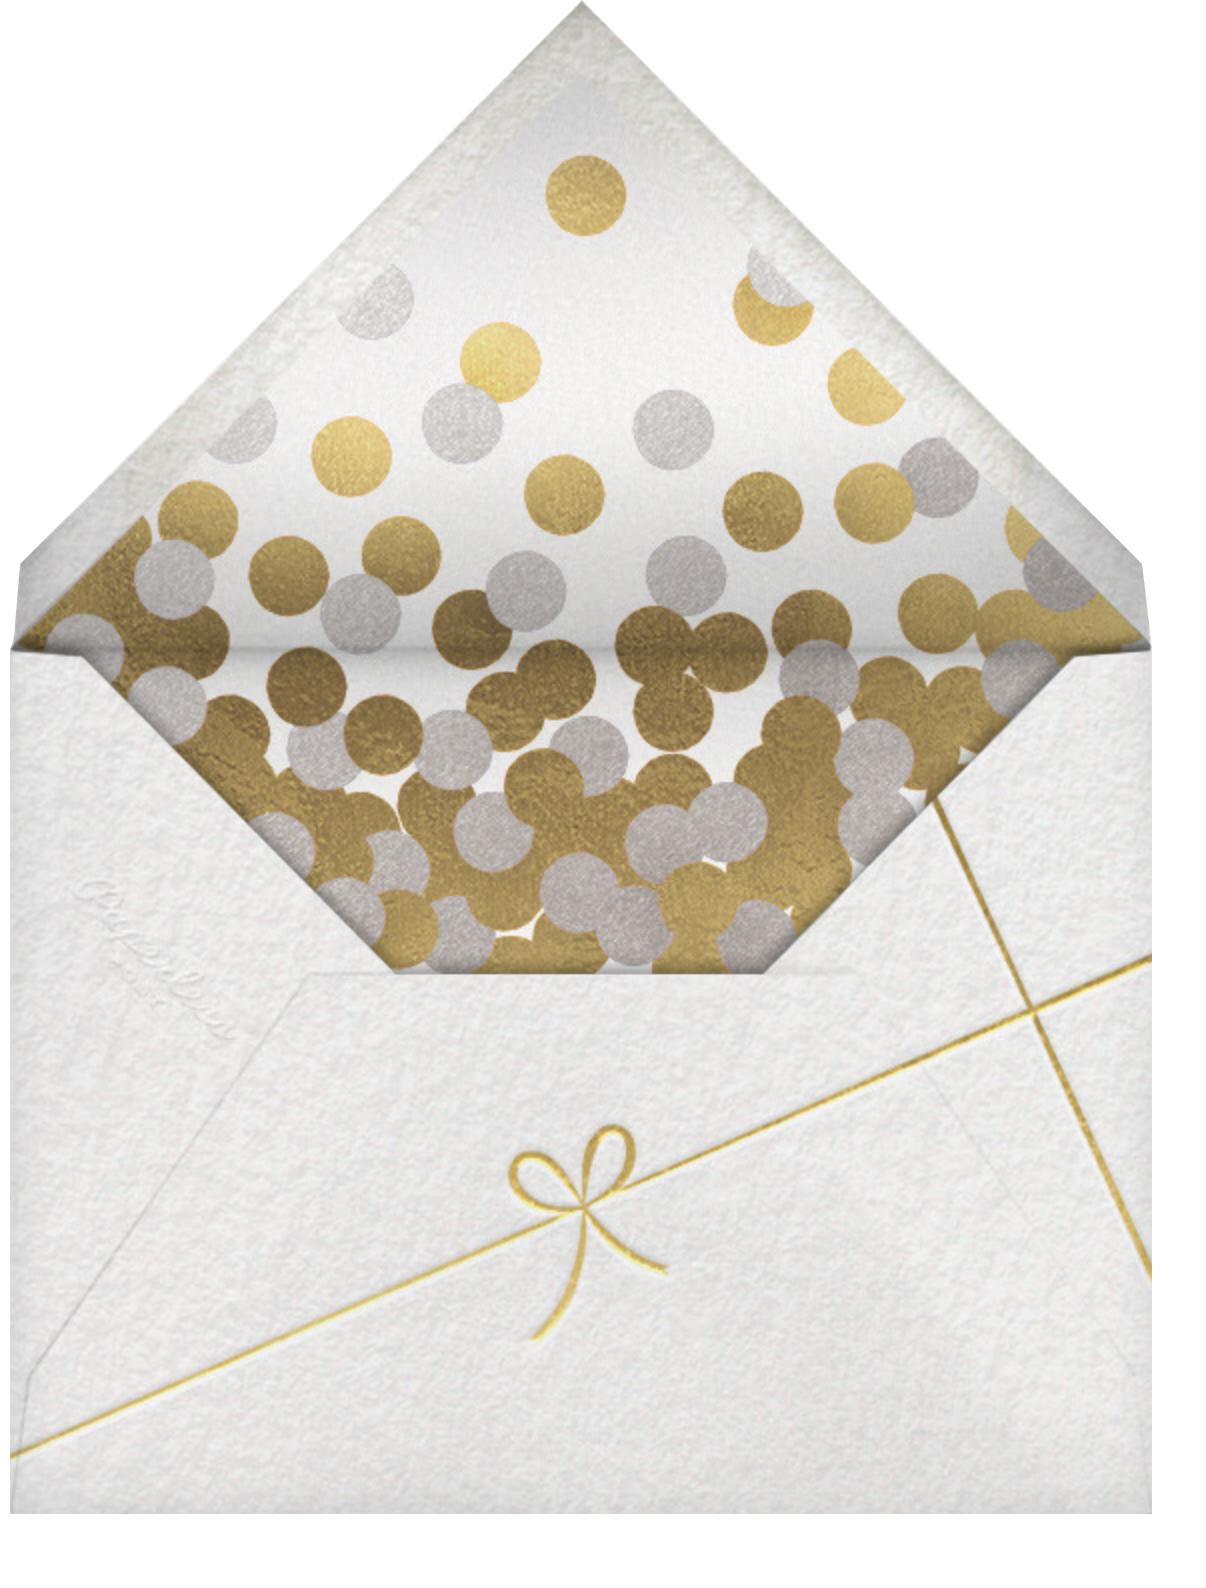 Avant-Garde Holiday (Horizontal) - Paperless Post - Envelope